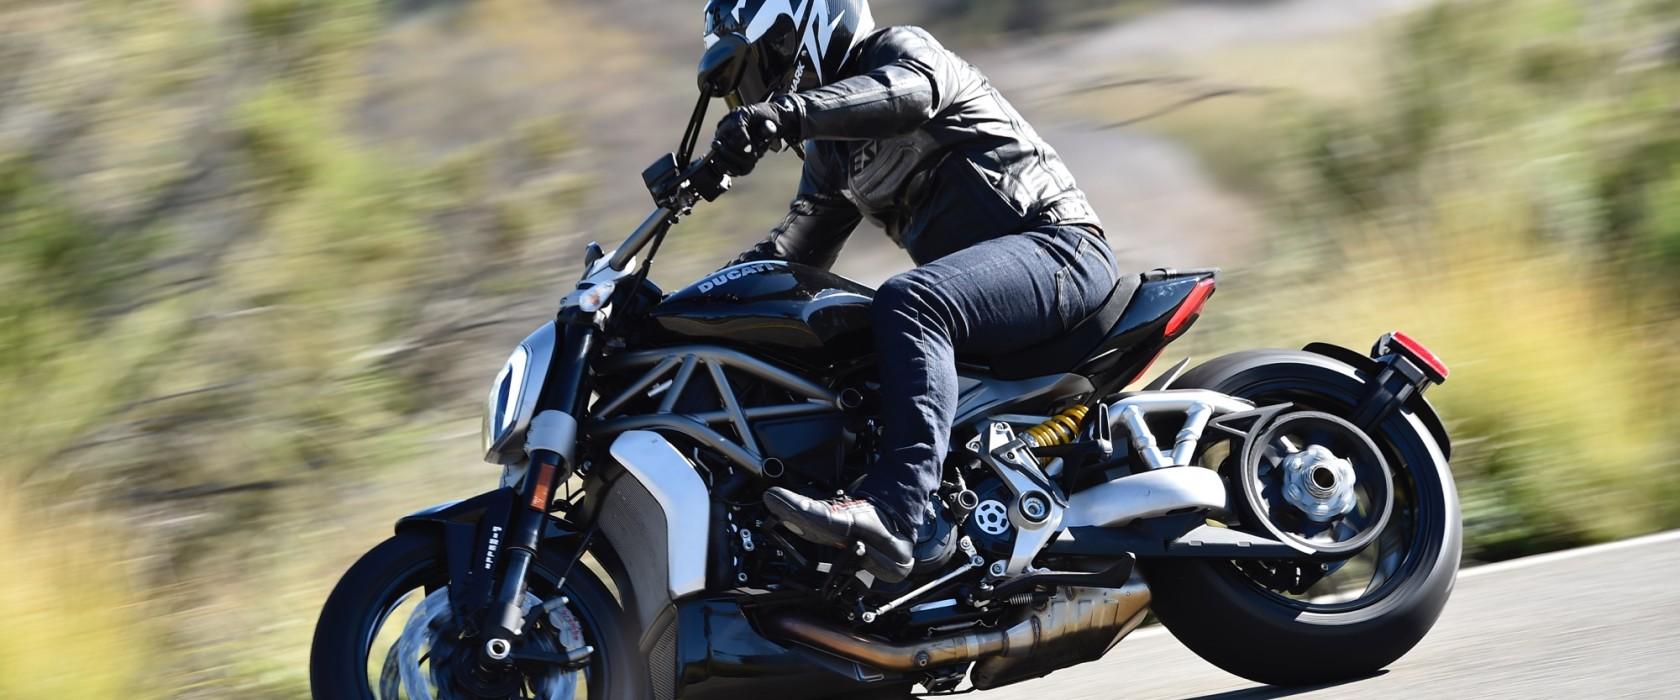 Ducati XDiavel test - 17